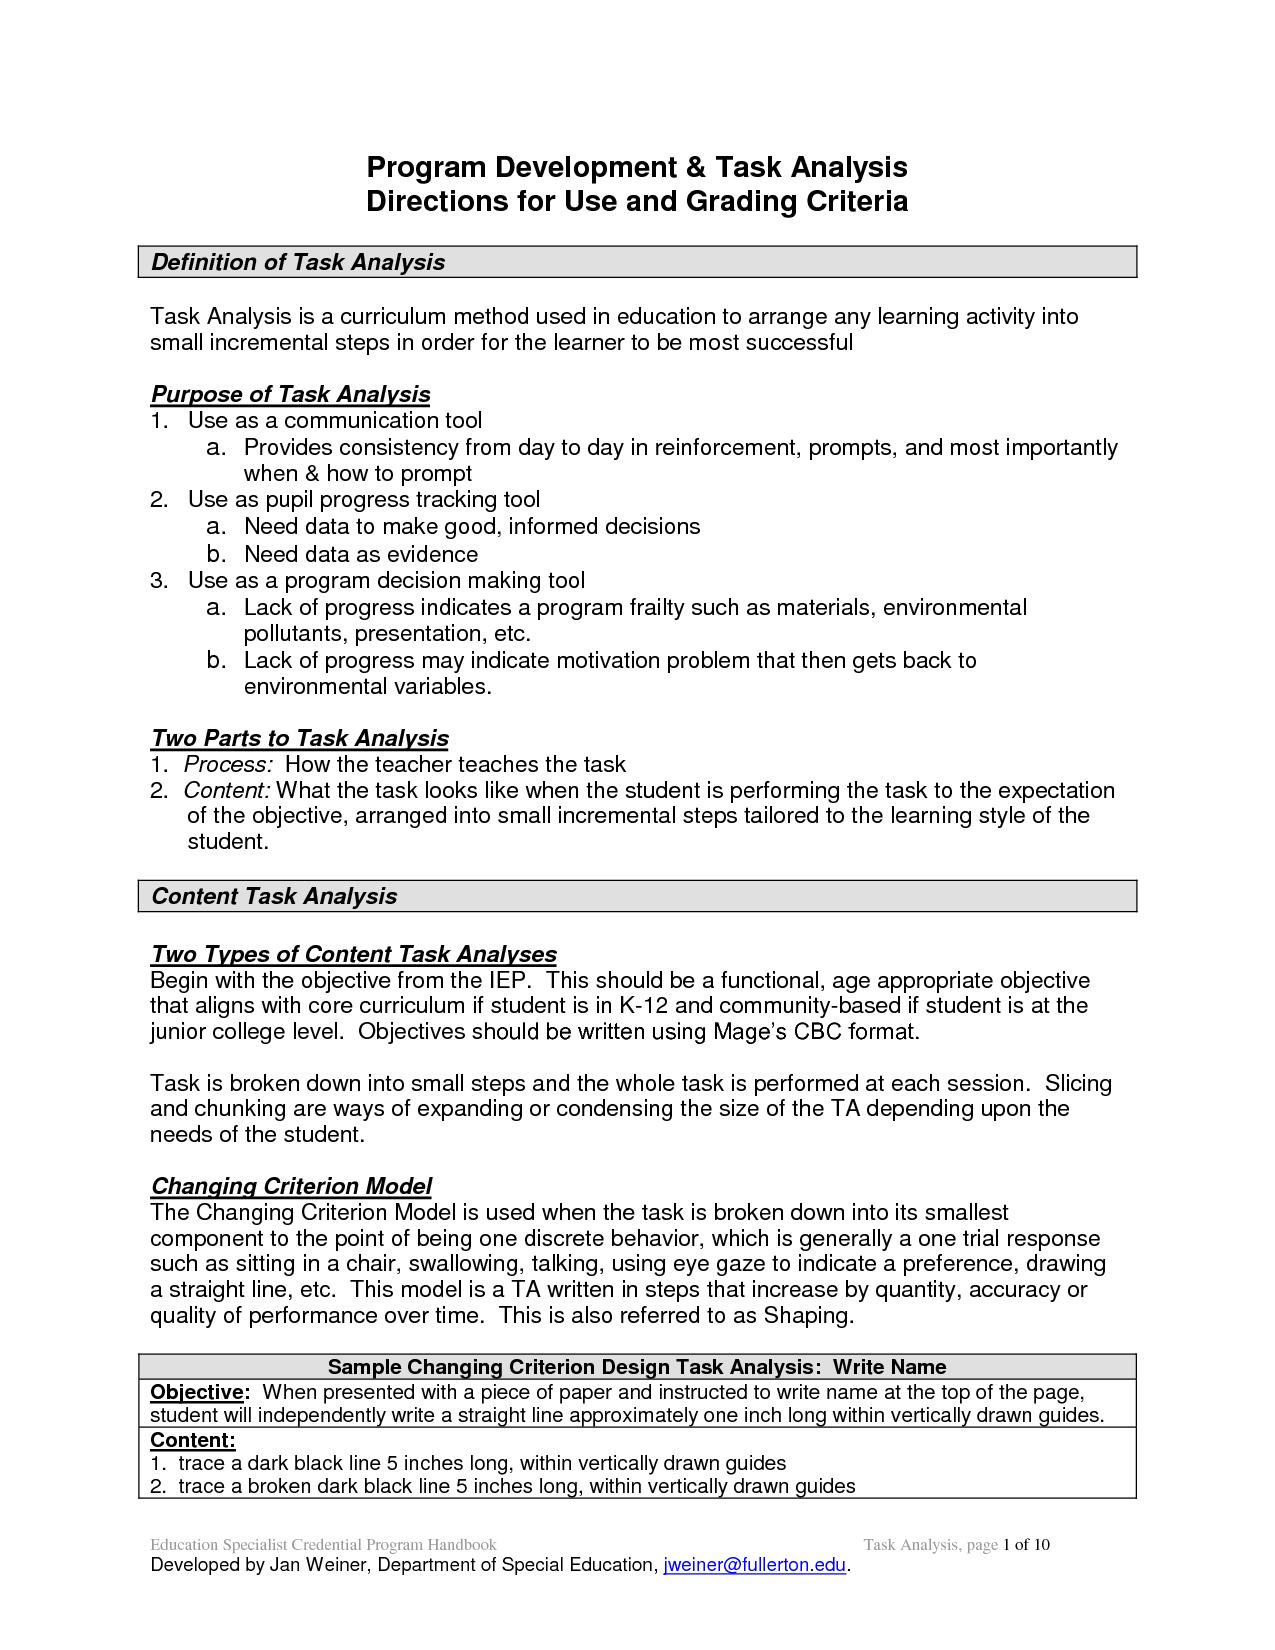 Discrete Trial Data Sheet Template